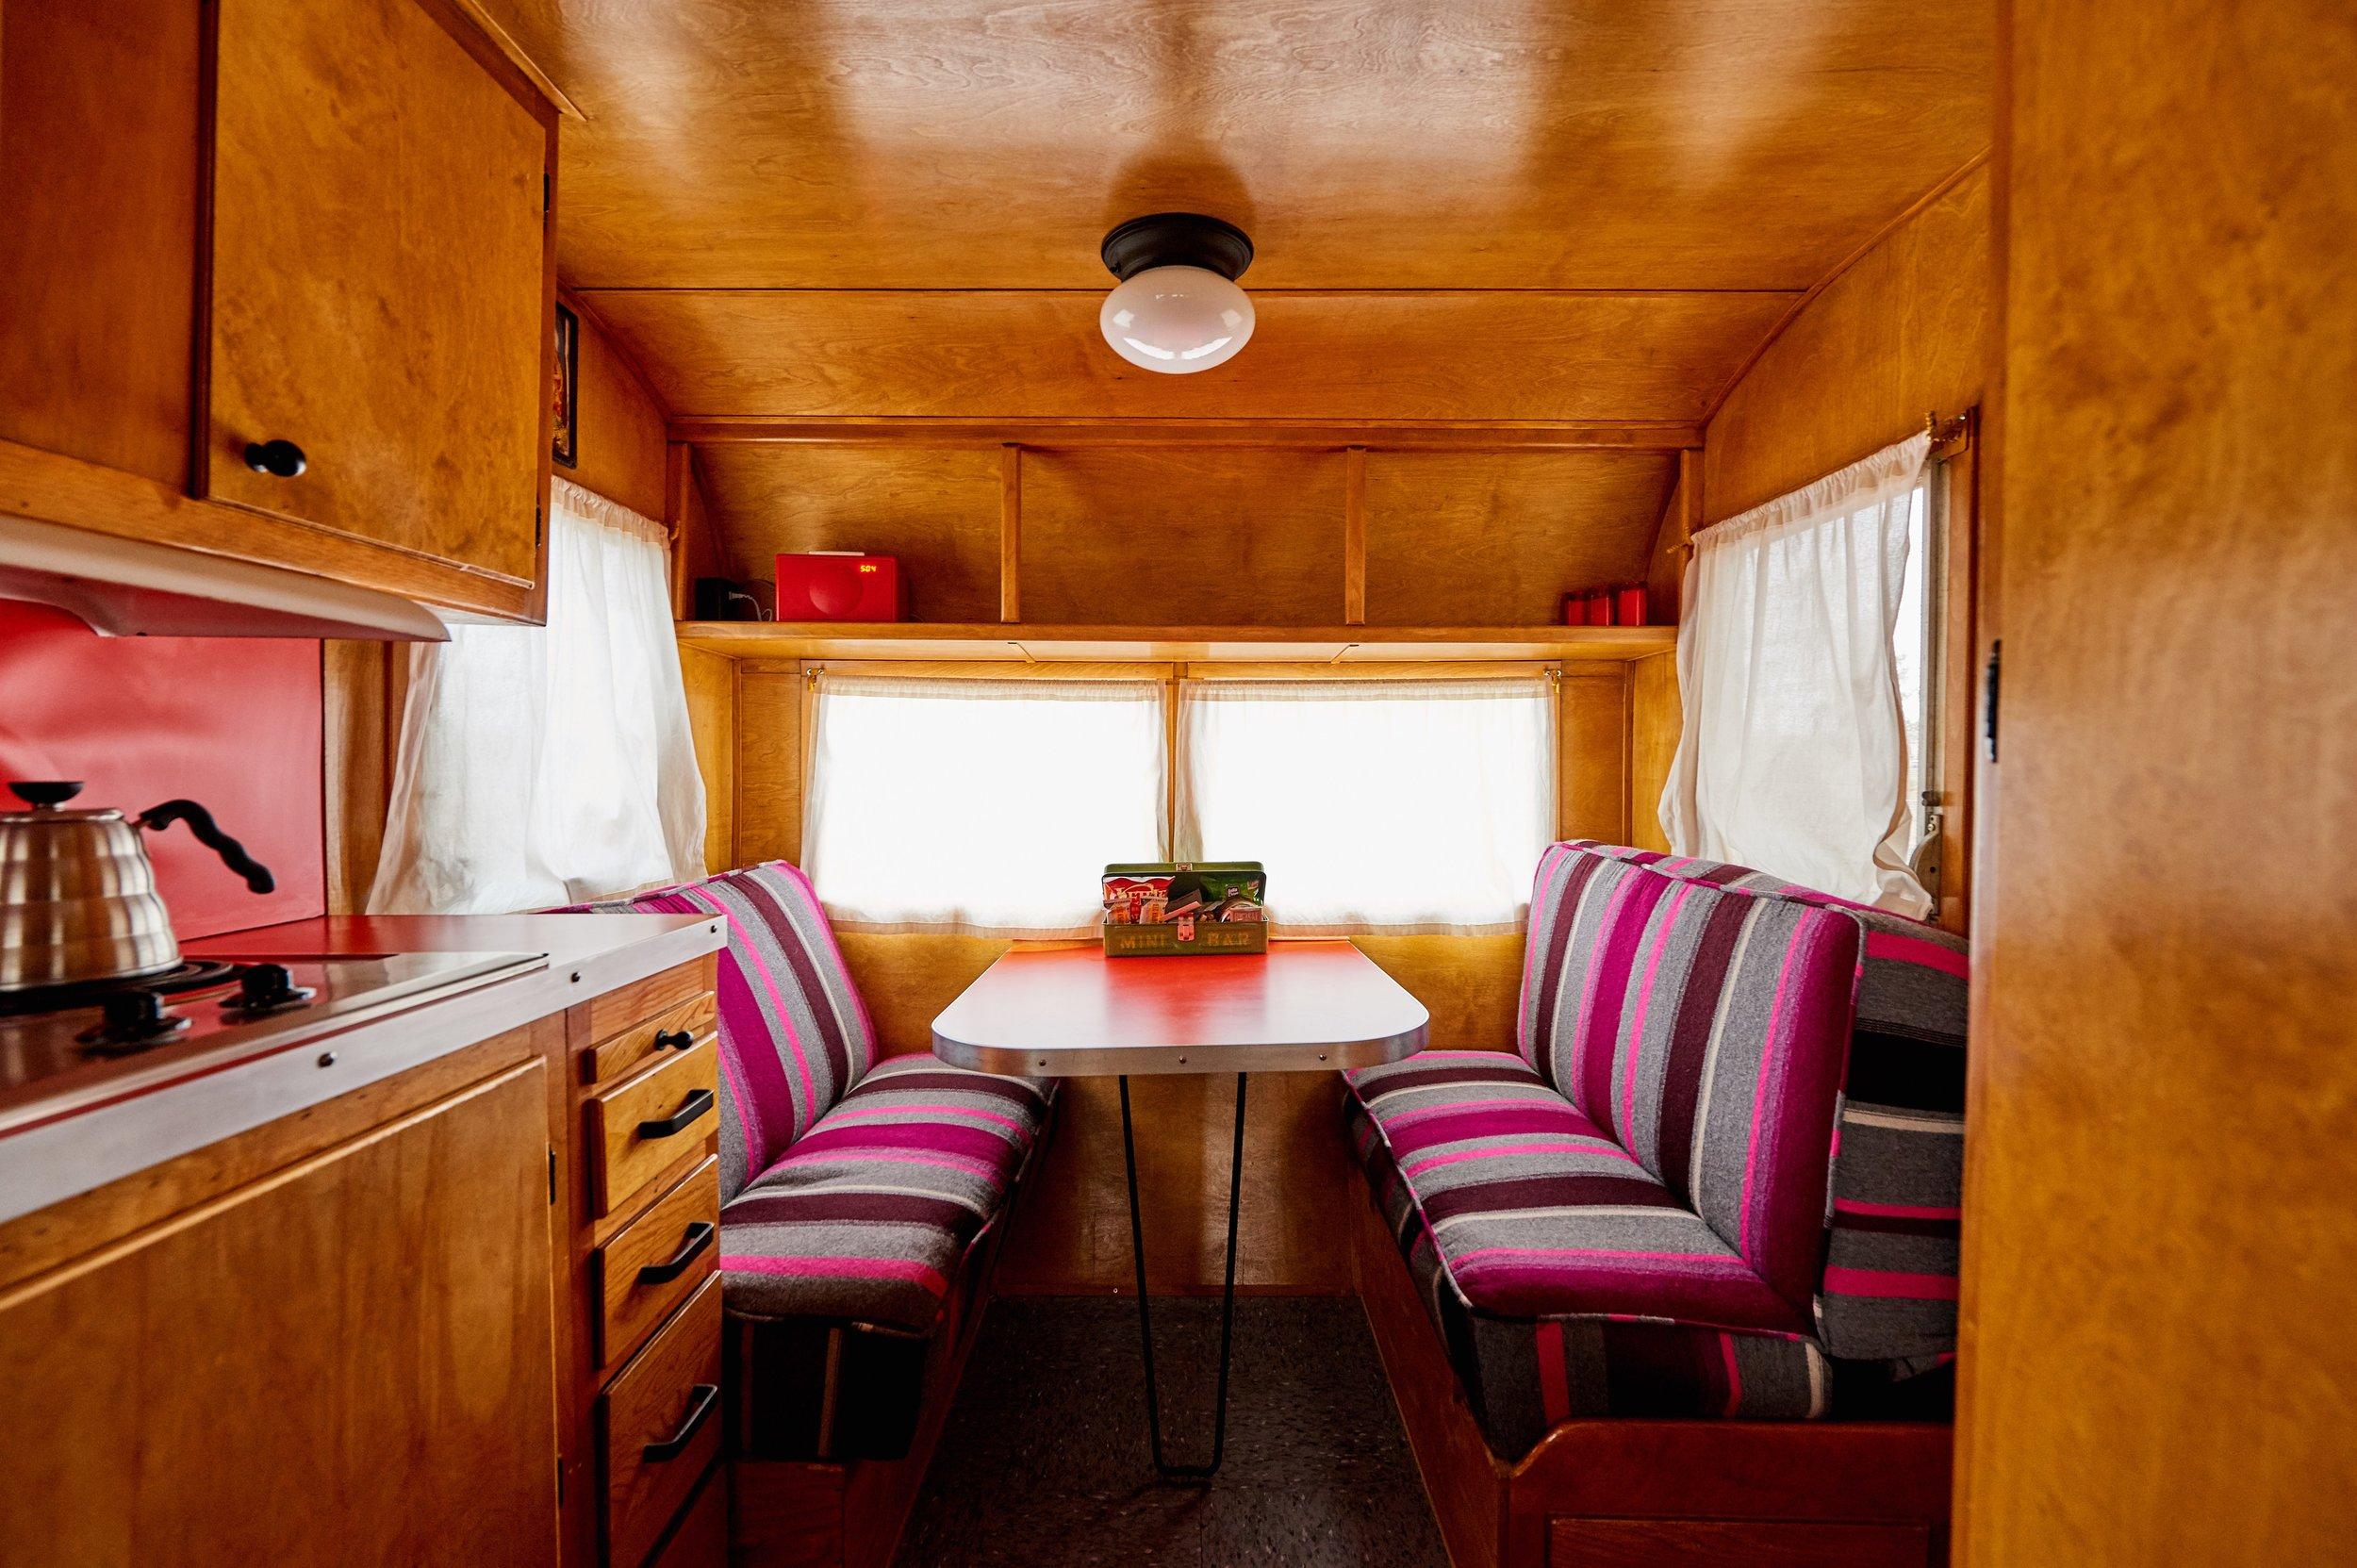 El Cosmico - Little Pinky interior 01 - Nick Simonite .jpg